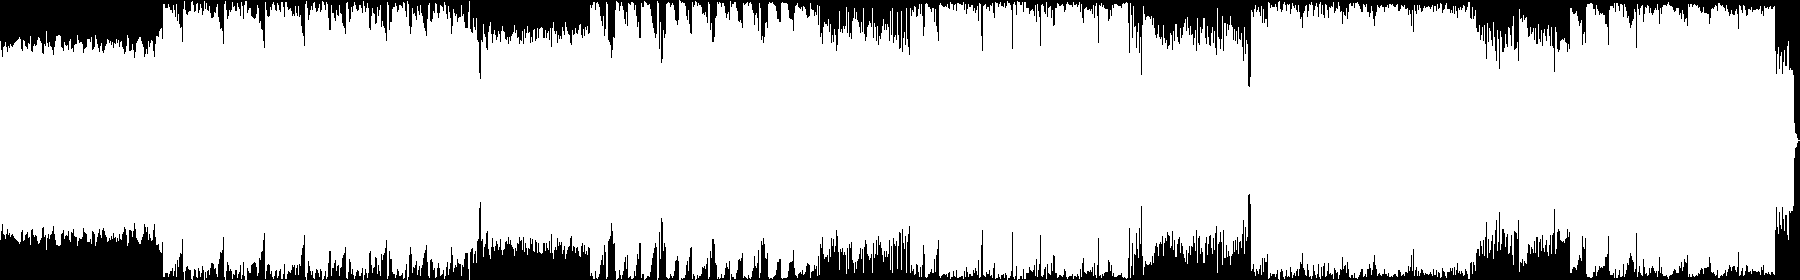 Colourz - Hybrid OVO Elements audio waveform